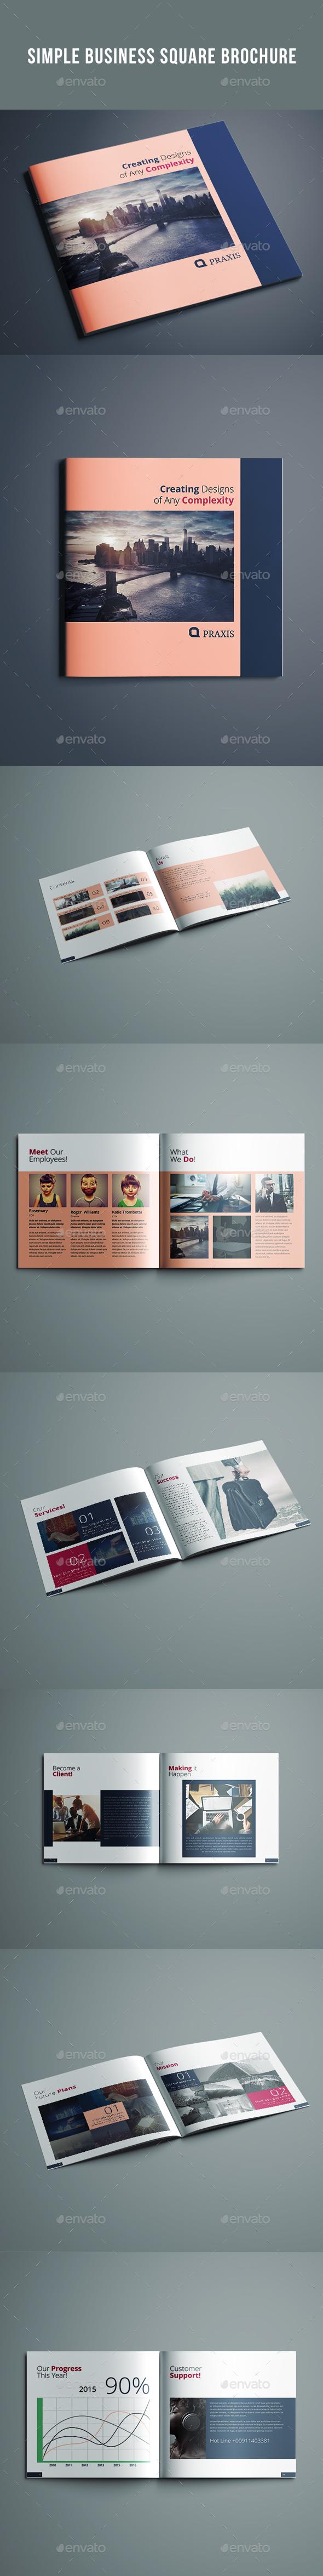 Simple Business Square Brochure - Catalogs Brochures